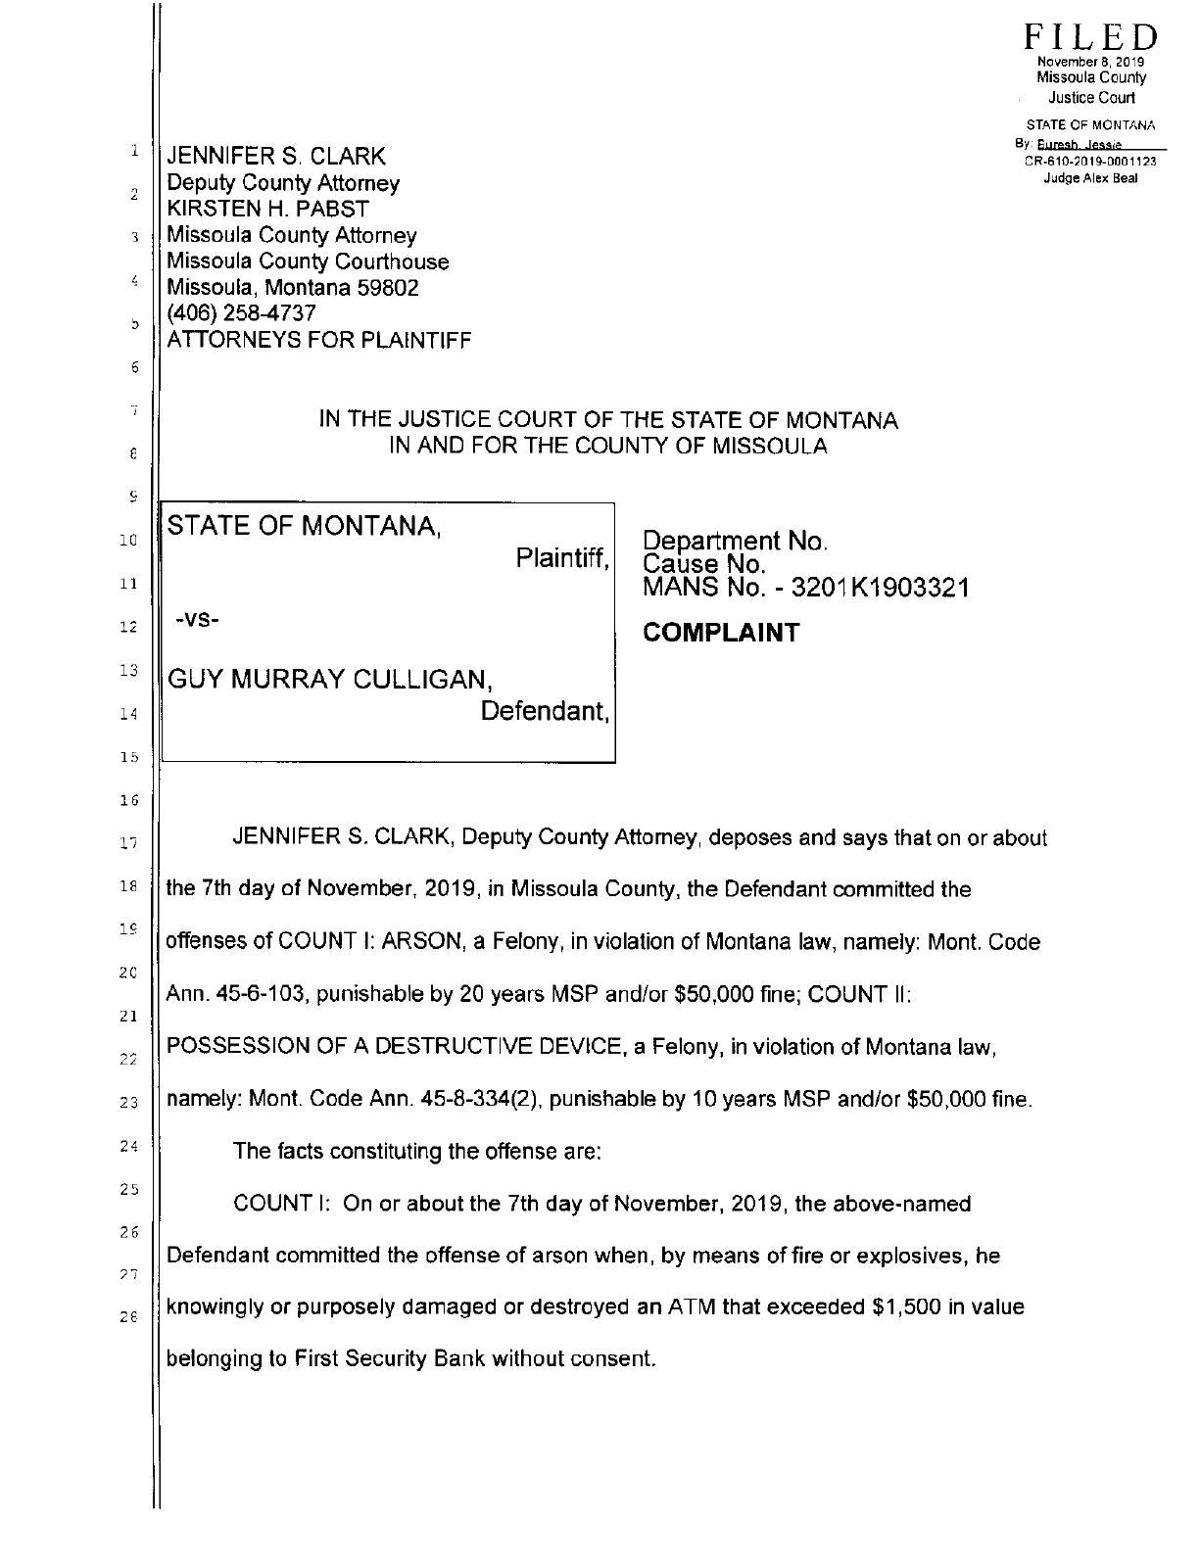 Guy Murray Culligan - Affidavit & Complaint